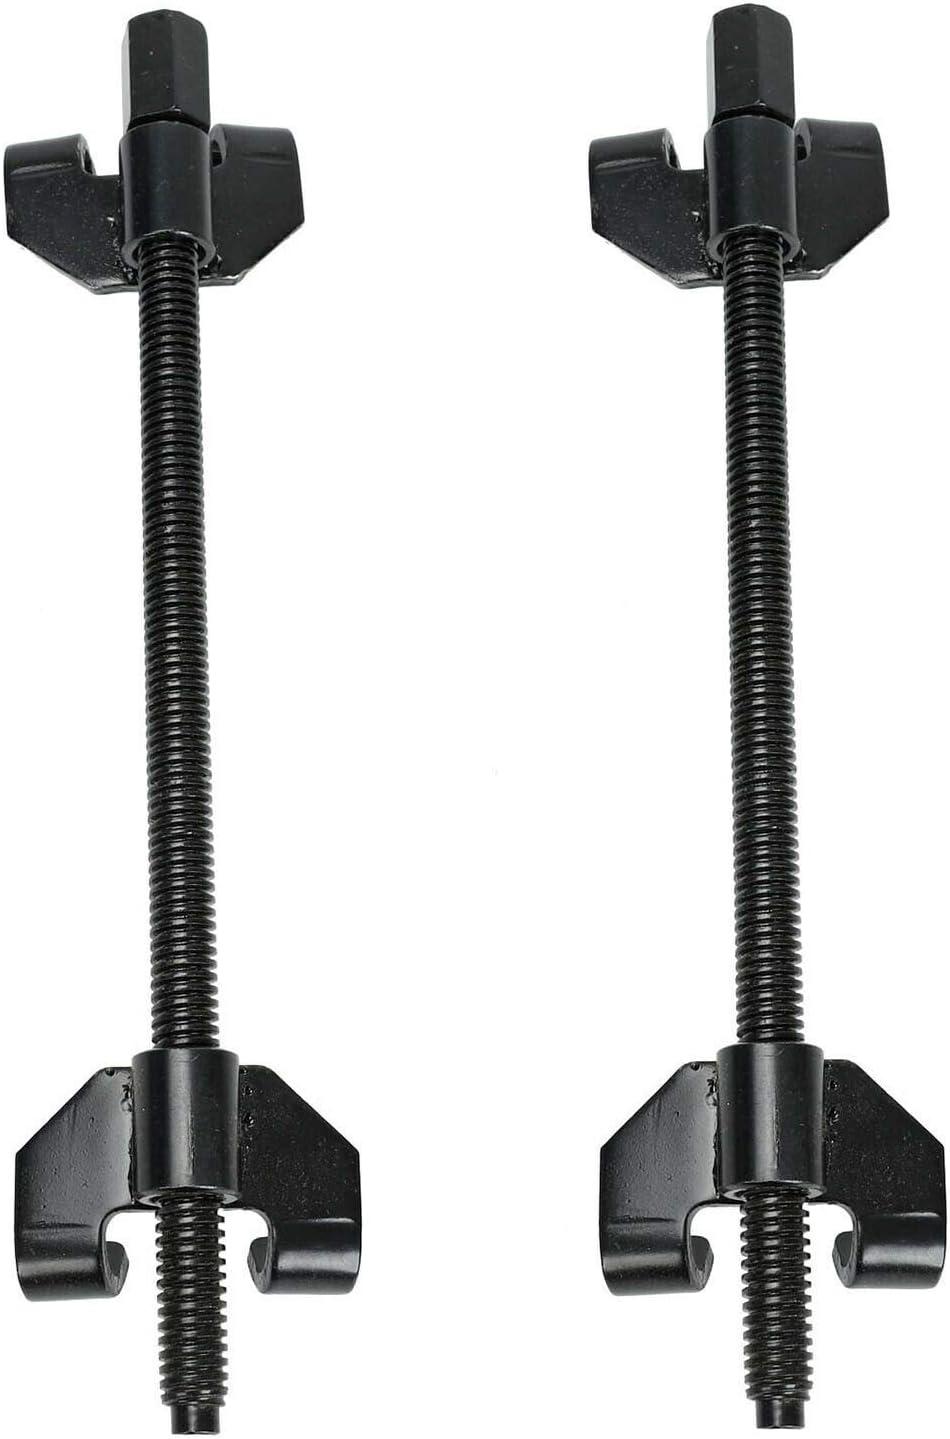 EASYBERG 14 Coil Spring Compressor Strut Remover Installer Suspension Heavy Duty